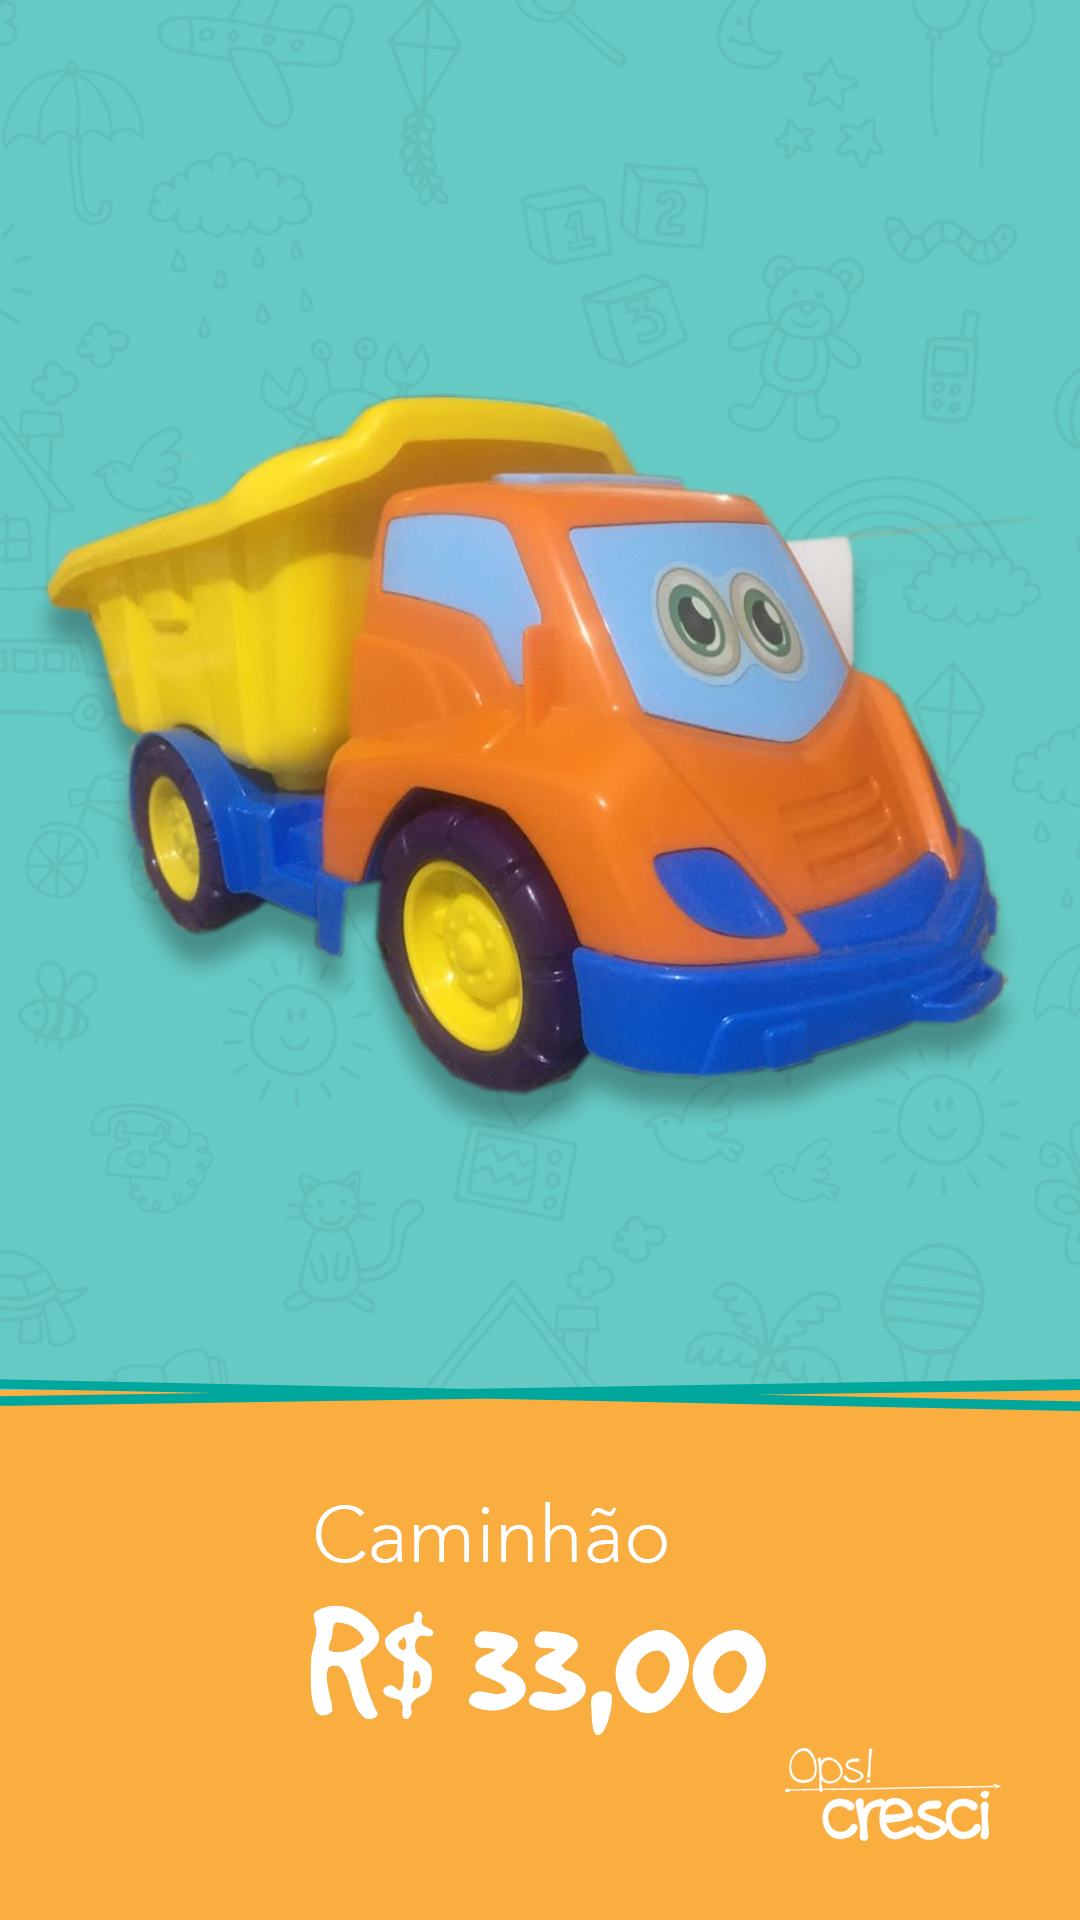 Stories - Brinquedos - 08